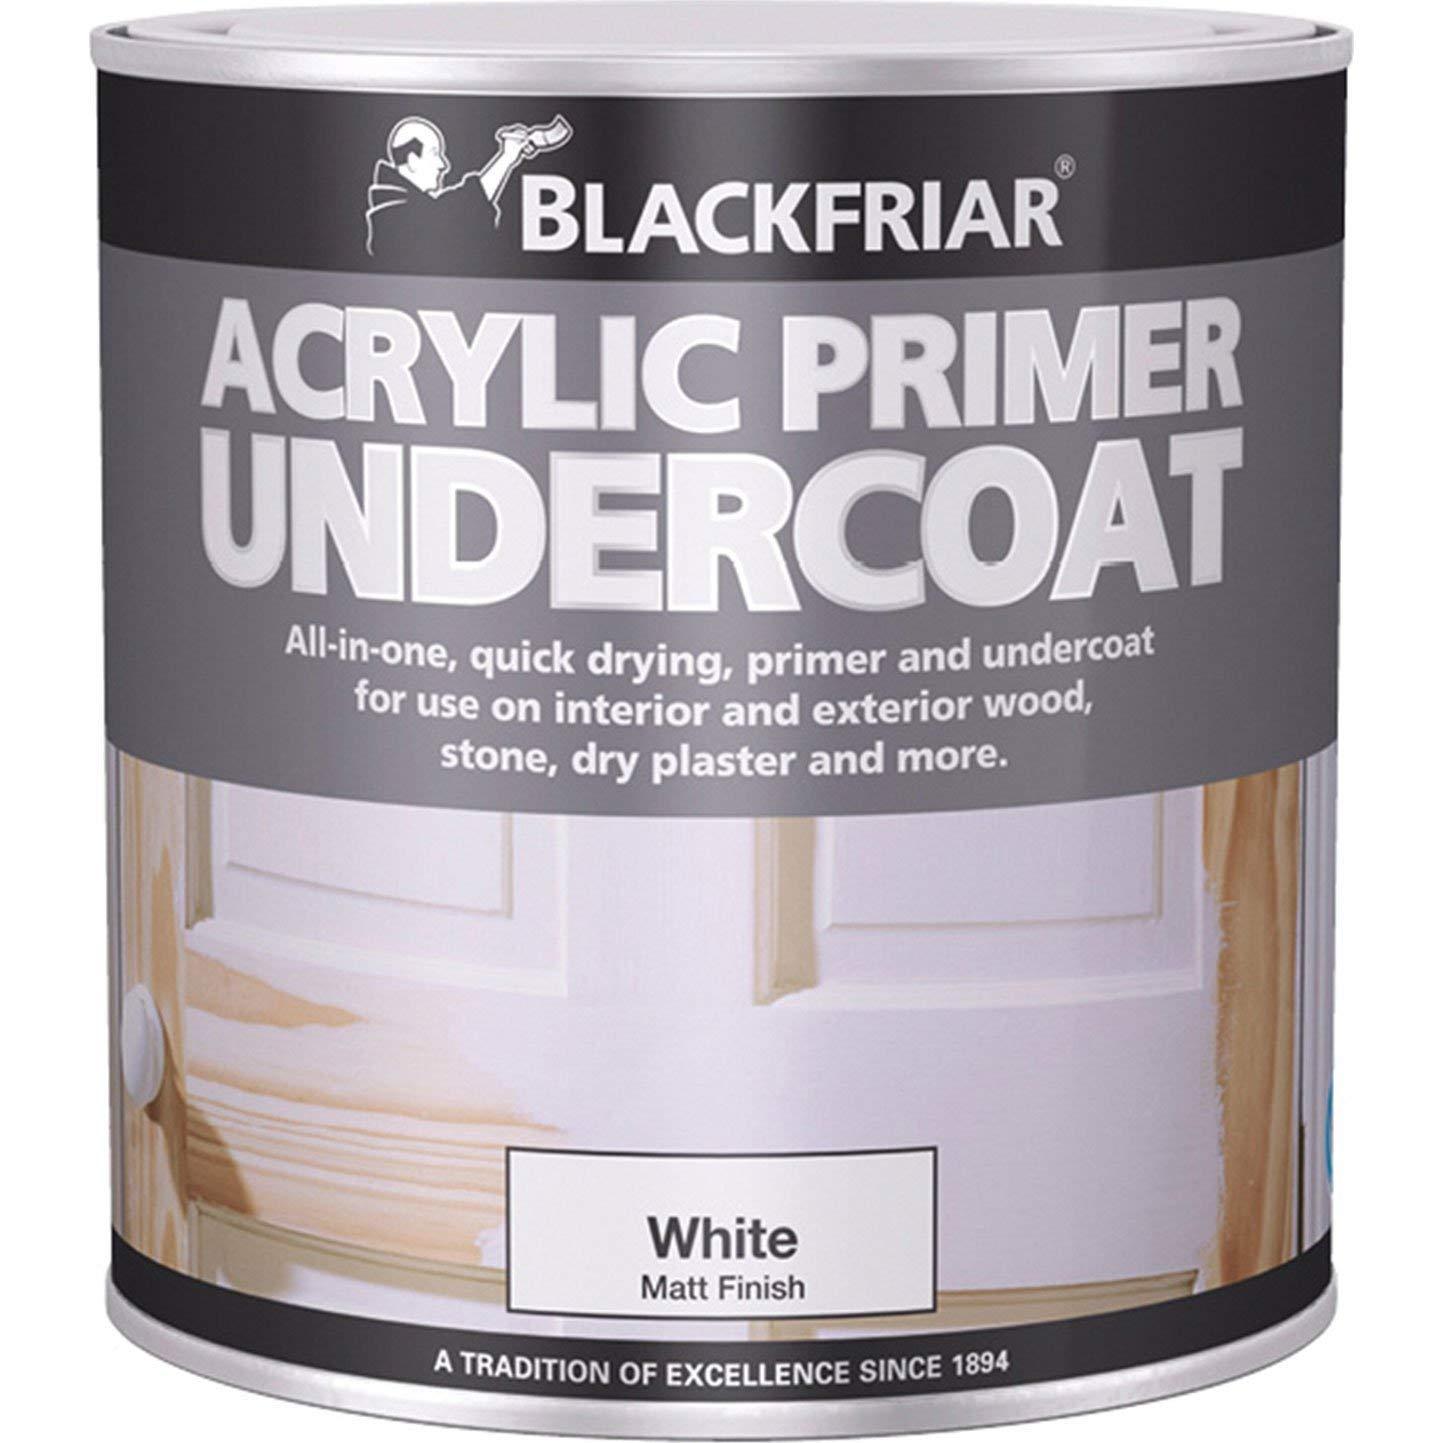 Blackfriar BKFGAP250 Quick Drying Acrylic Primer Undercoat, 250 ml, Grey Toolbank